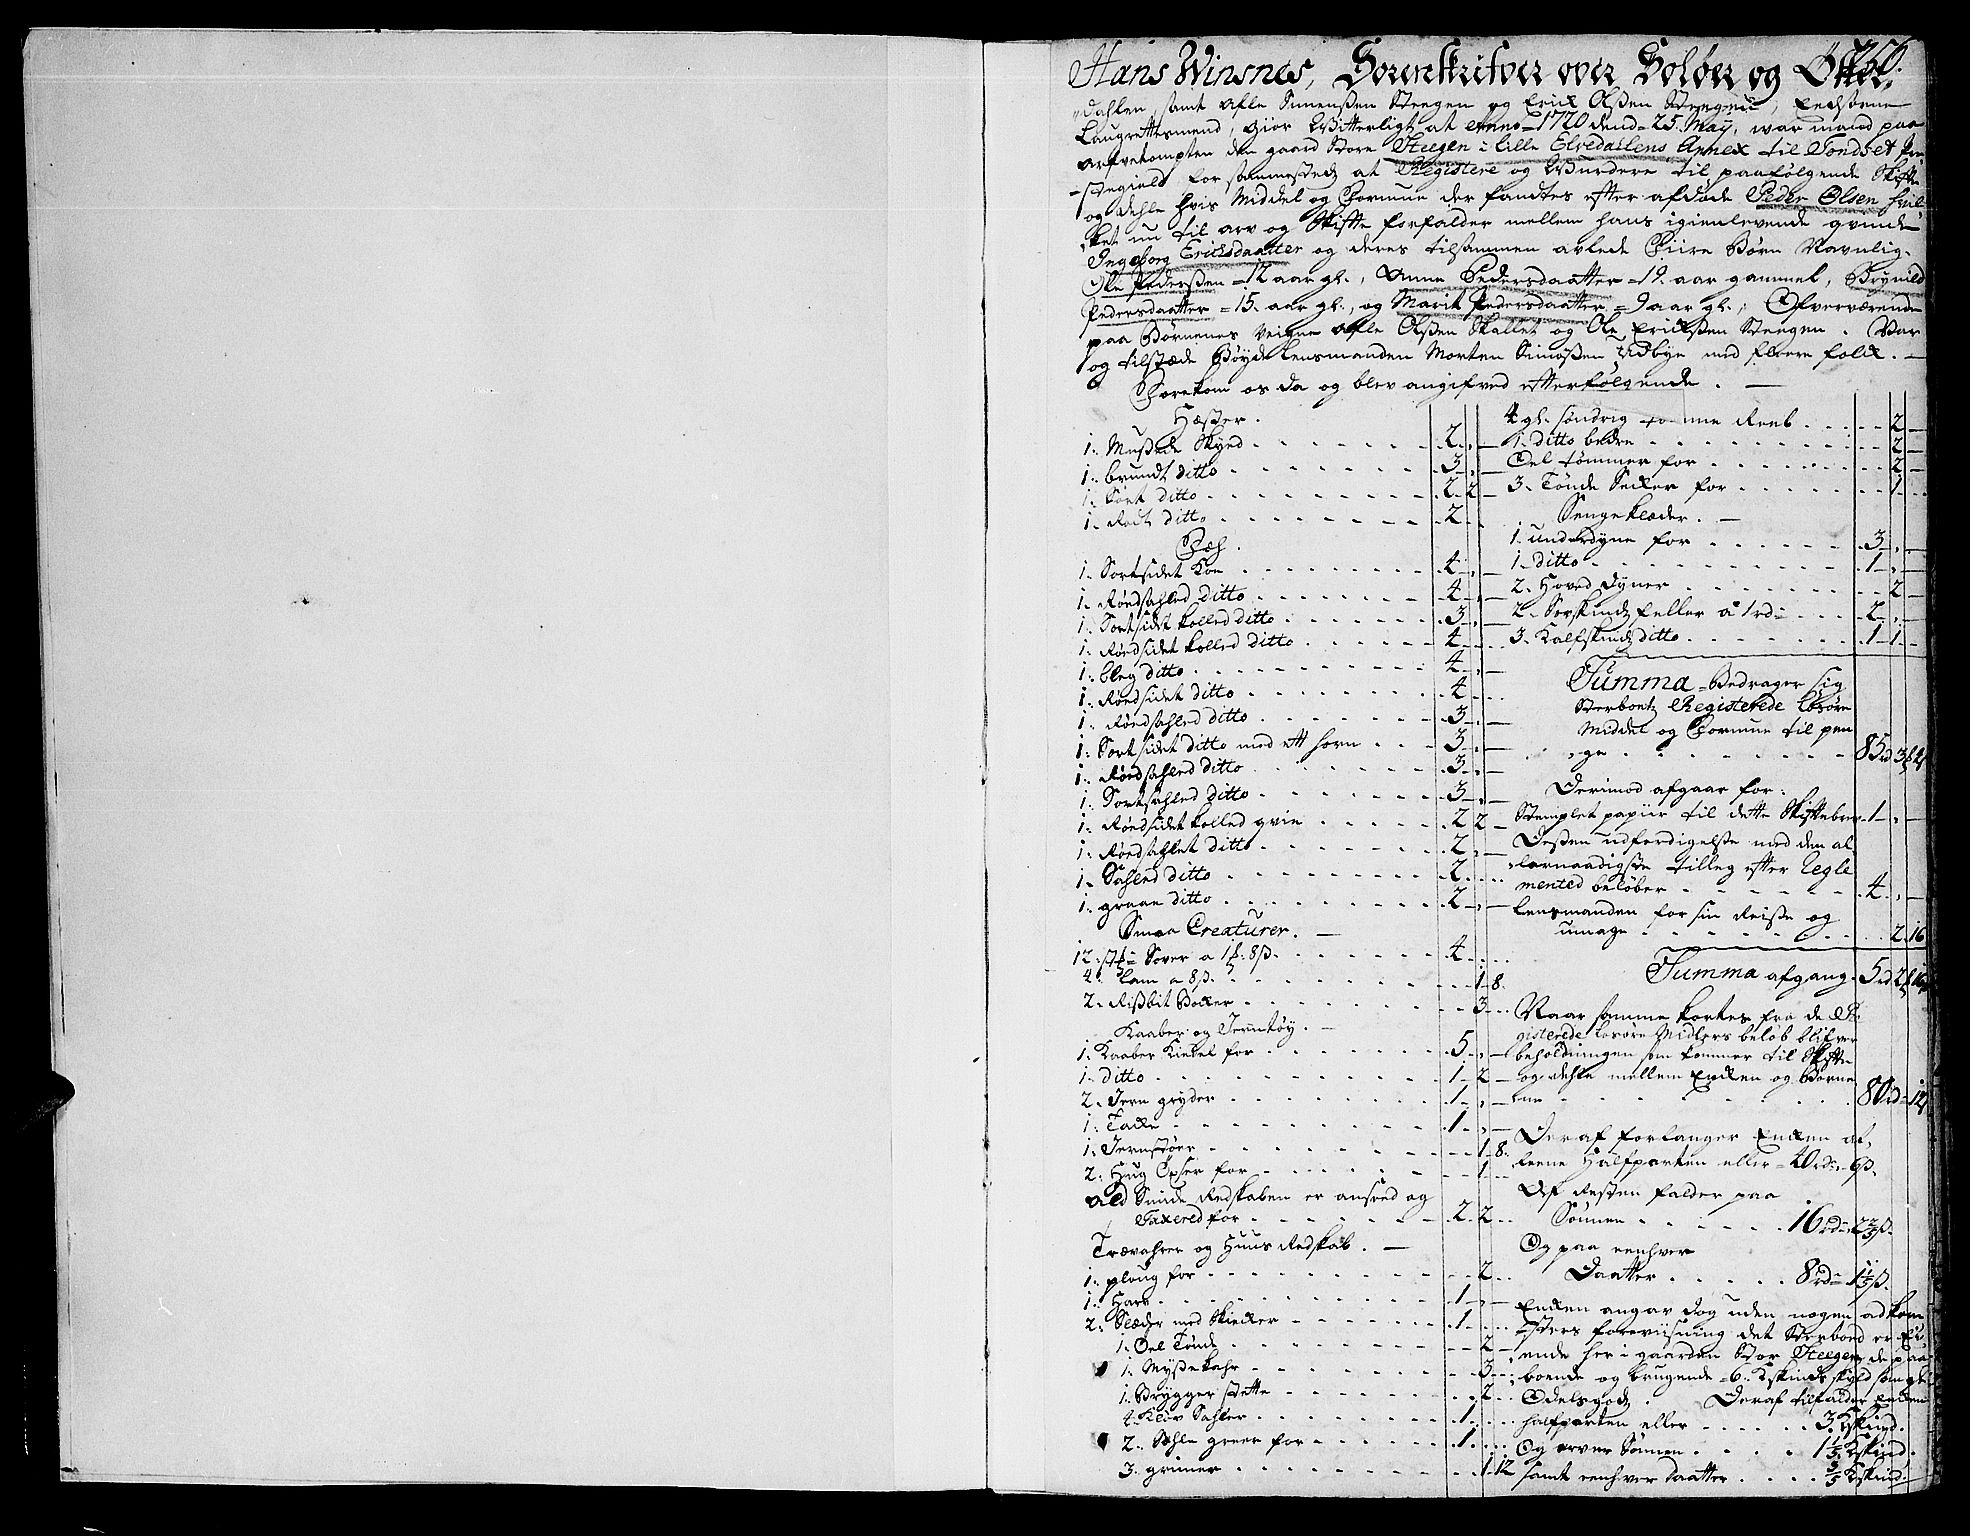 SAH, Solør og Østerdalen sorenskriveri, J/Ja/L0003A: Skifteprotokoll, 1716-1725, s. 256a